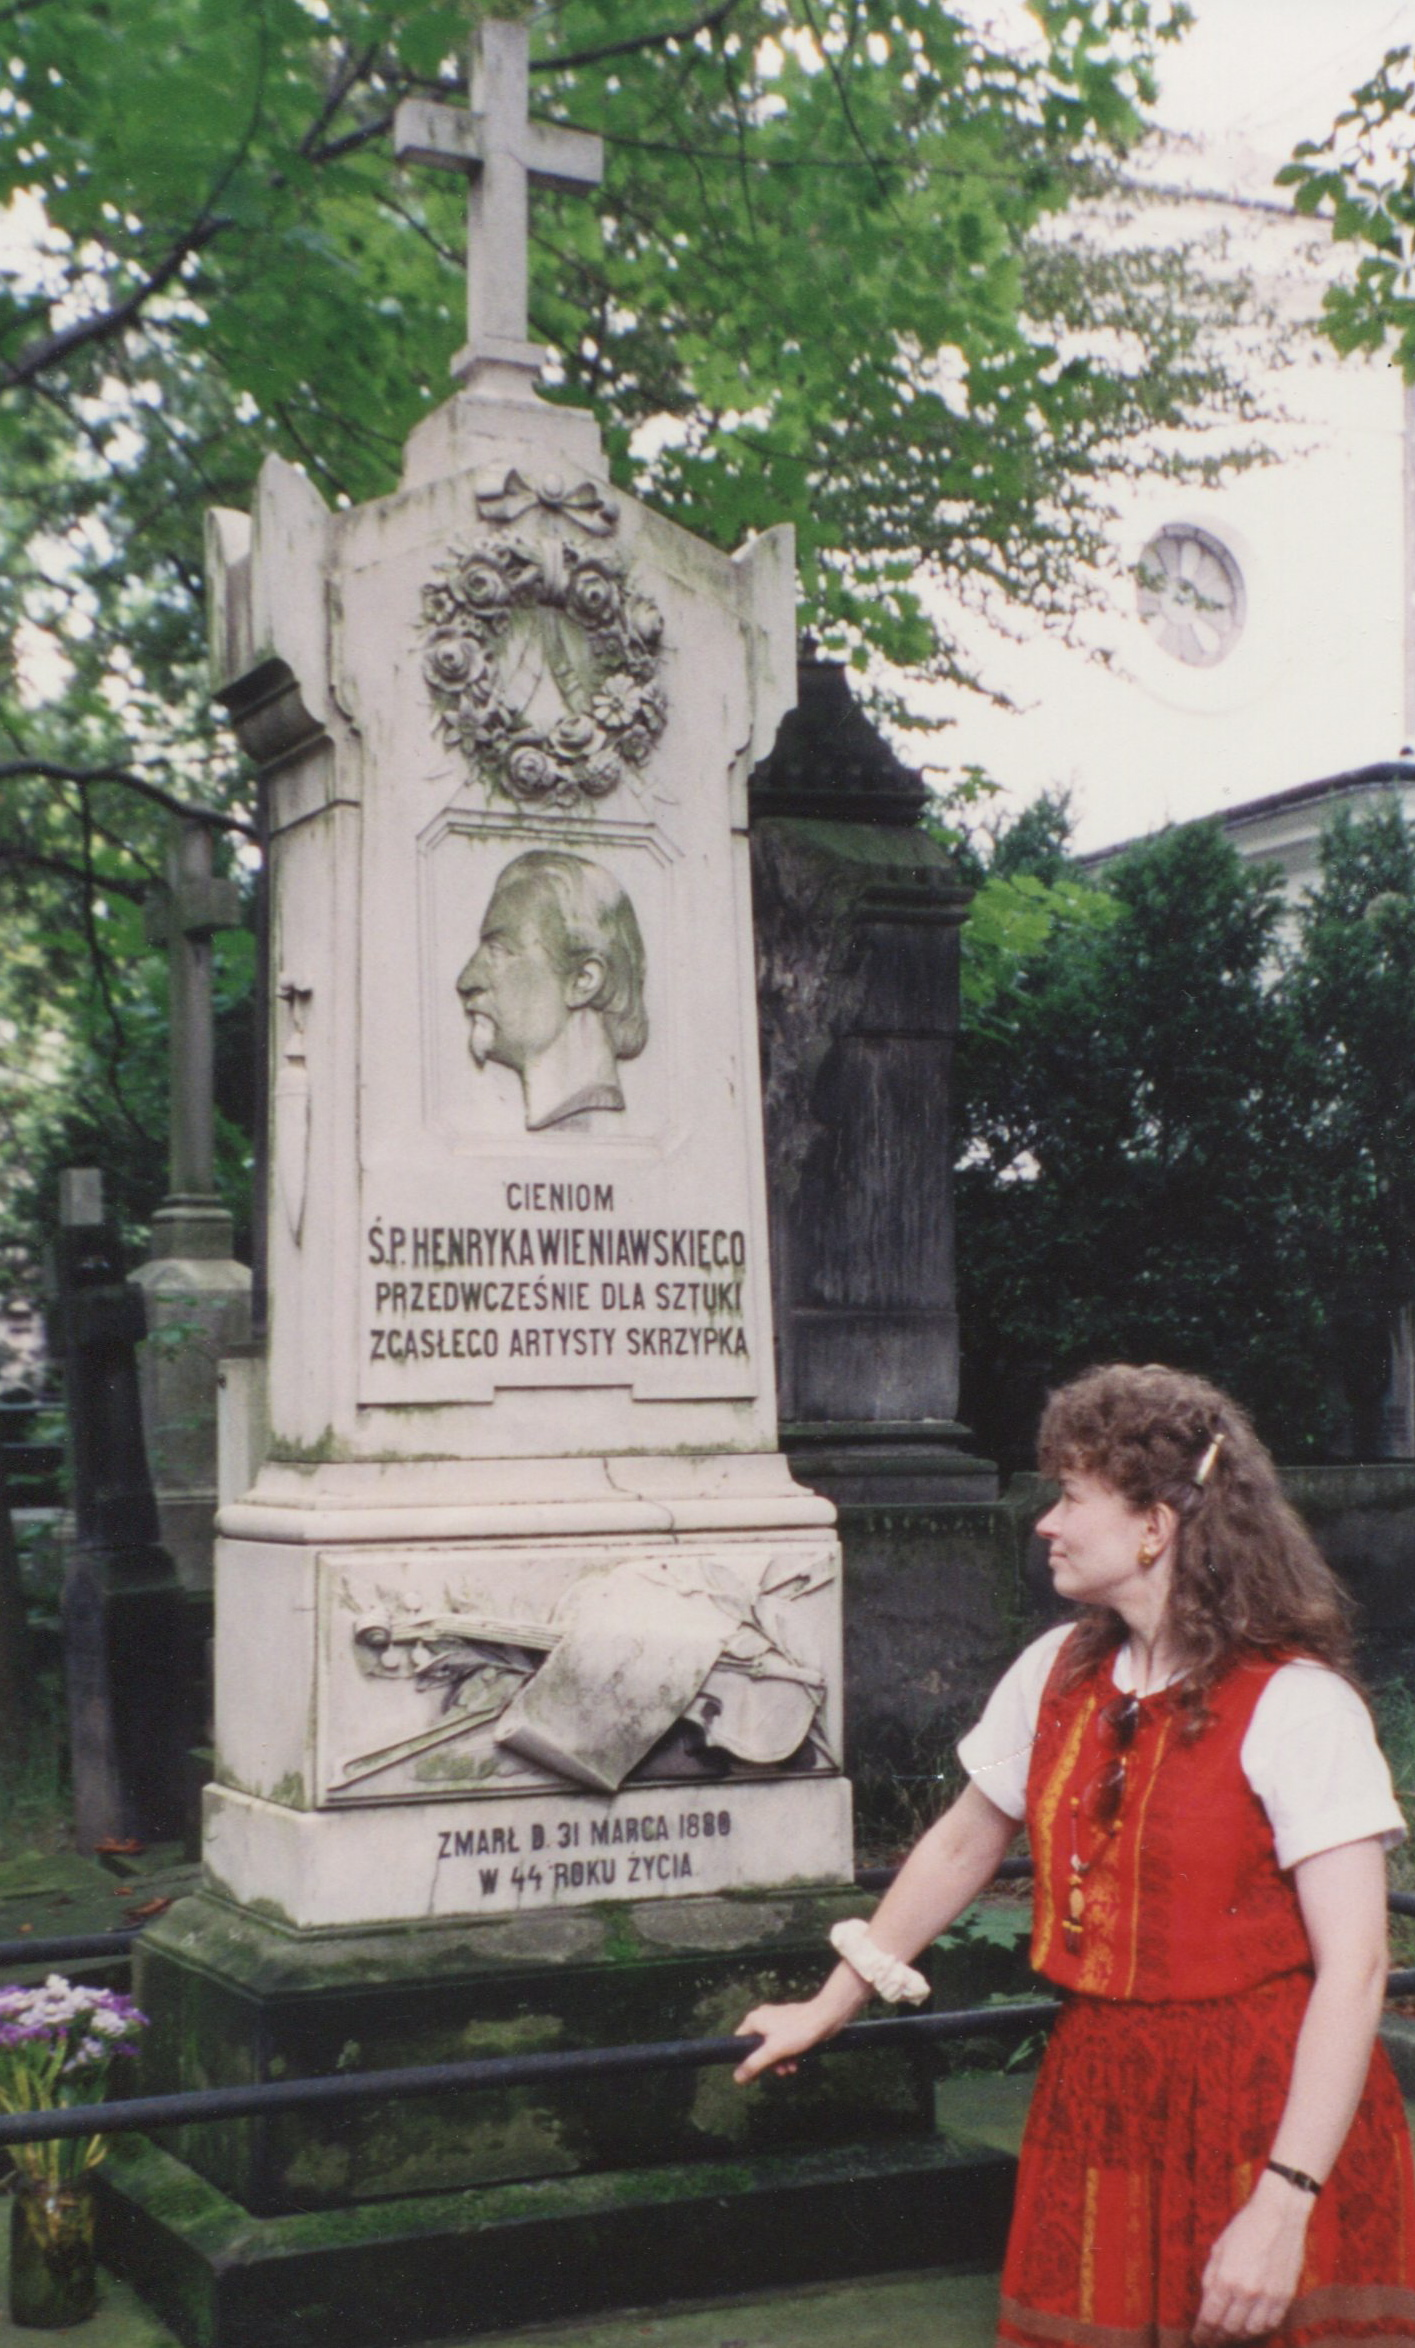 Giving respects at Henryk Wieniawski's grave at the Powazki Cemetary in Warsaw, Poland